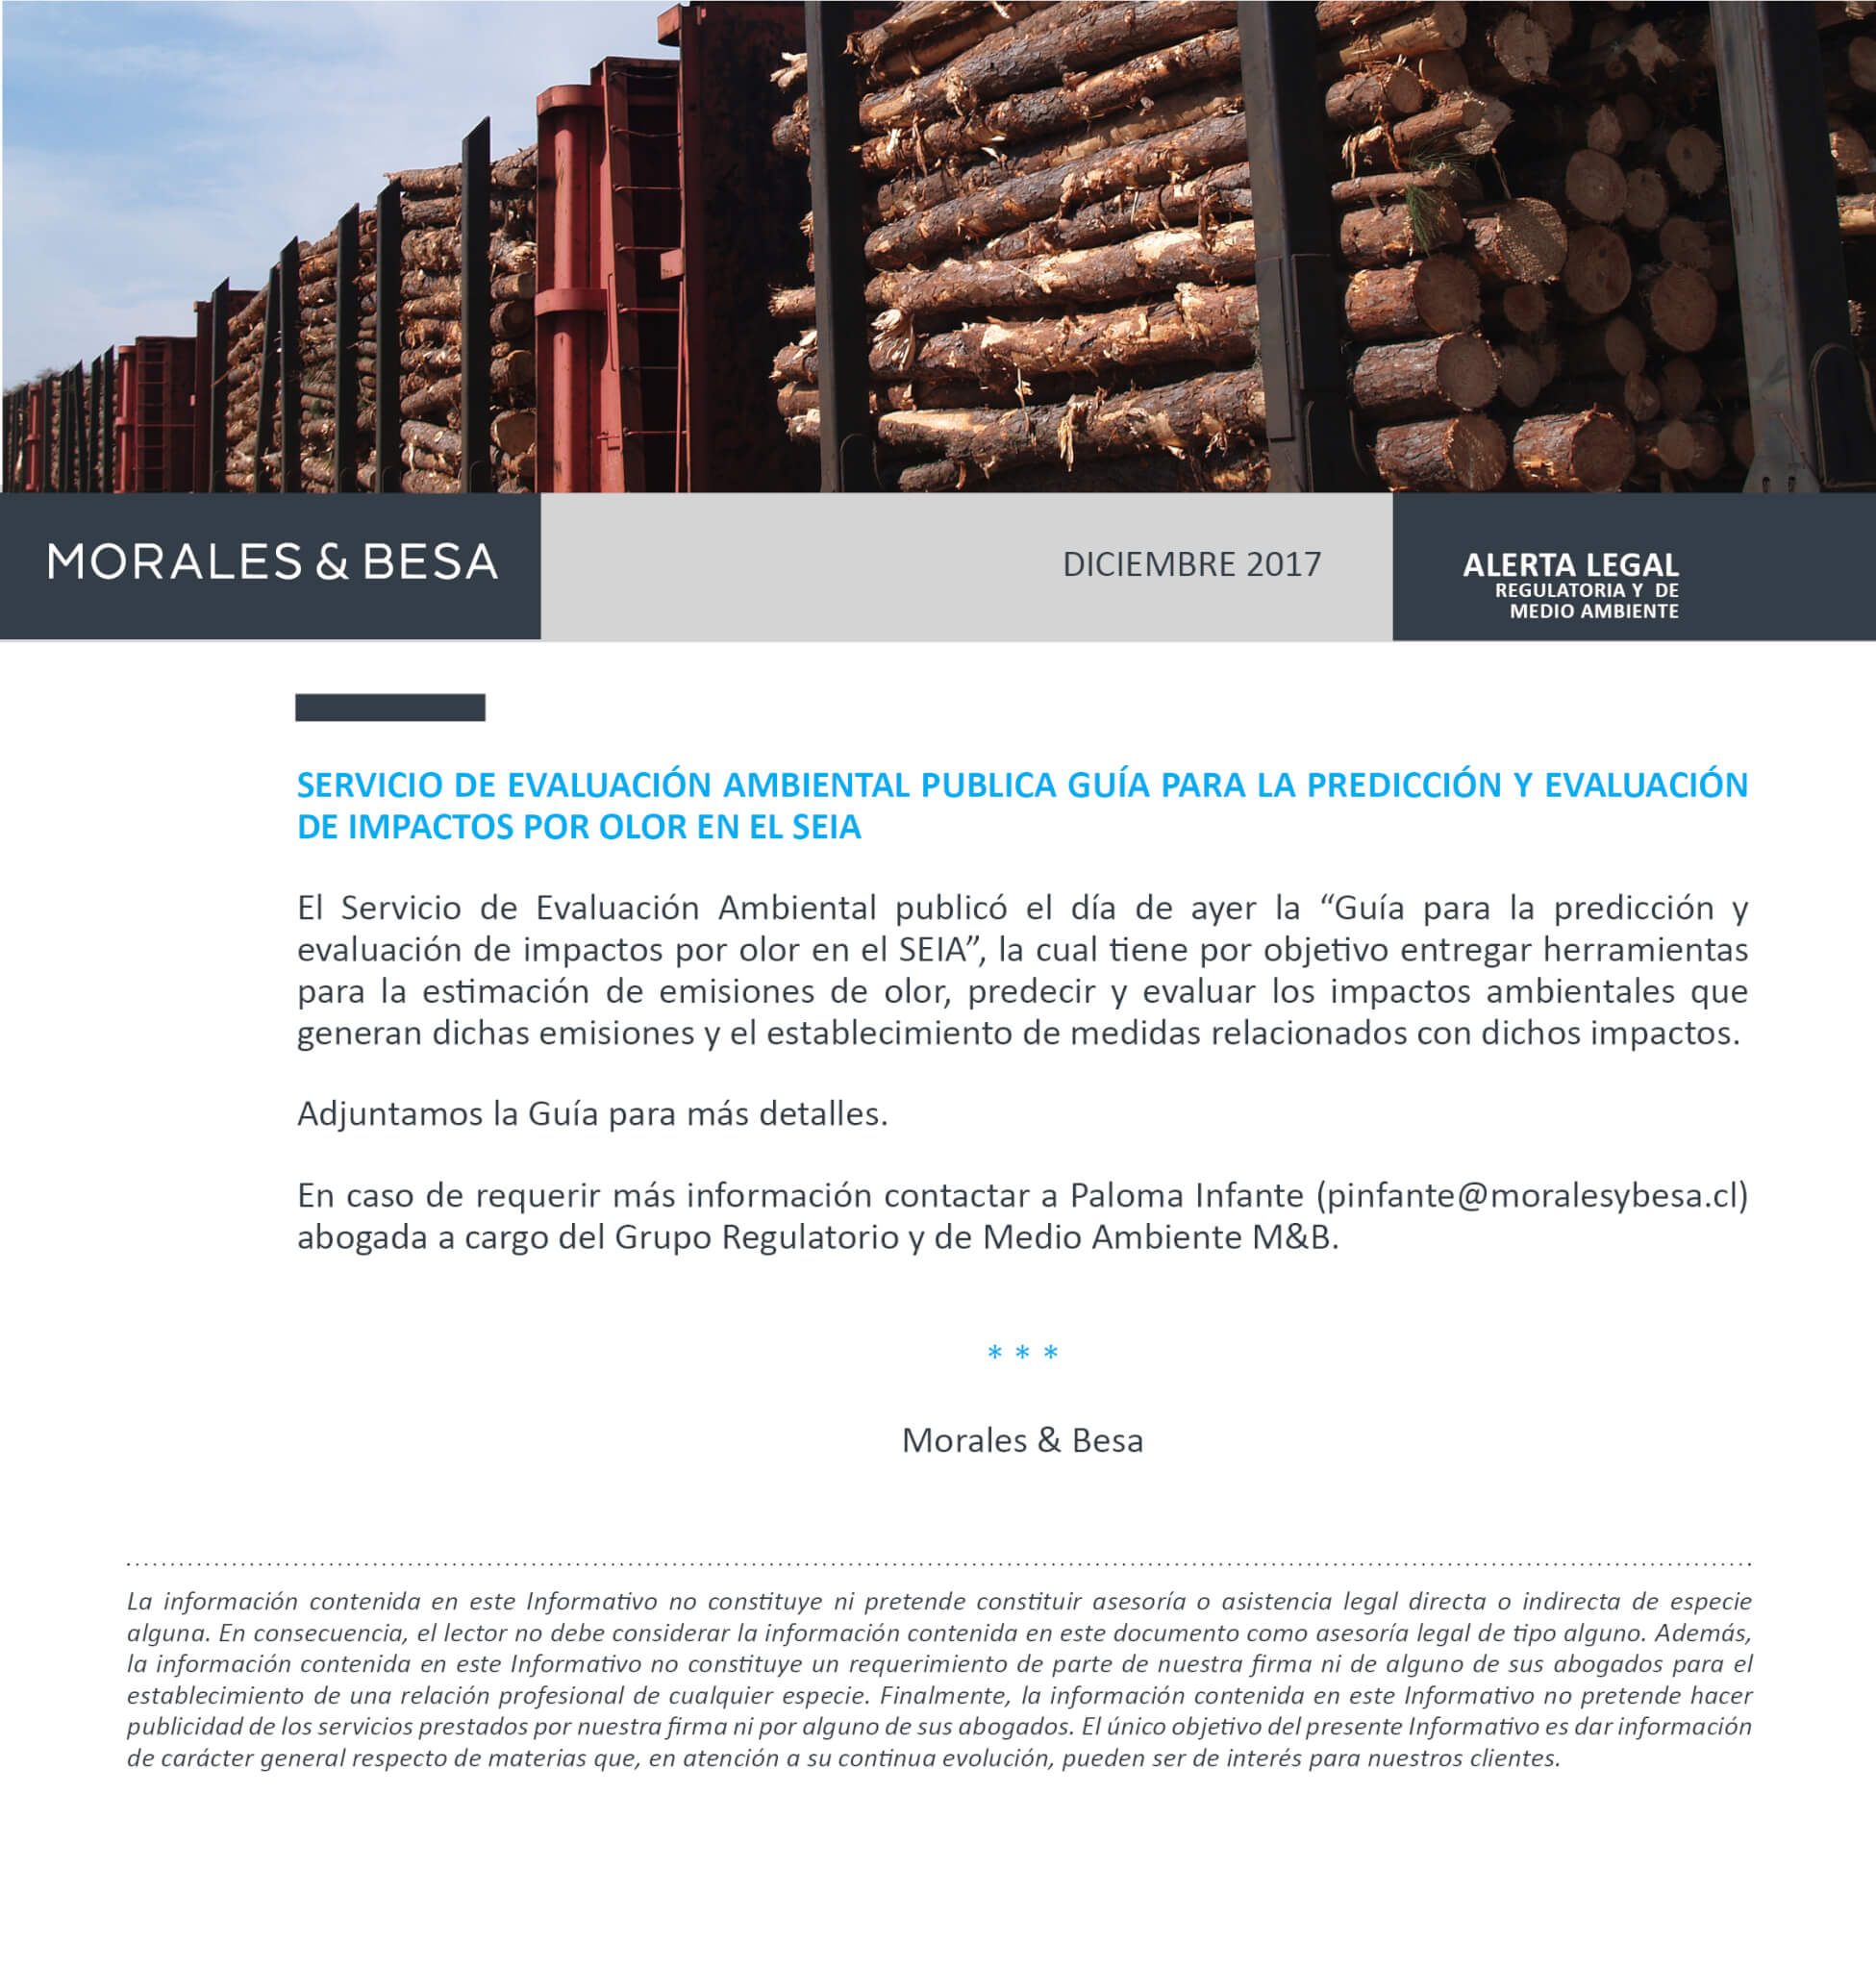 Morales & Besa_Alerta Legal_Regulatoria_Guía SEIA para olores_Diciembre 2017